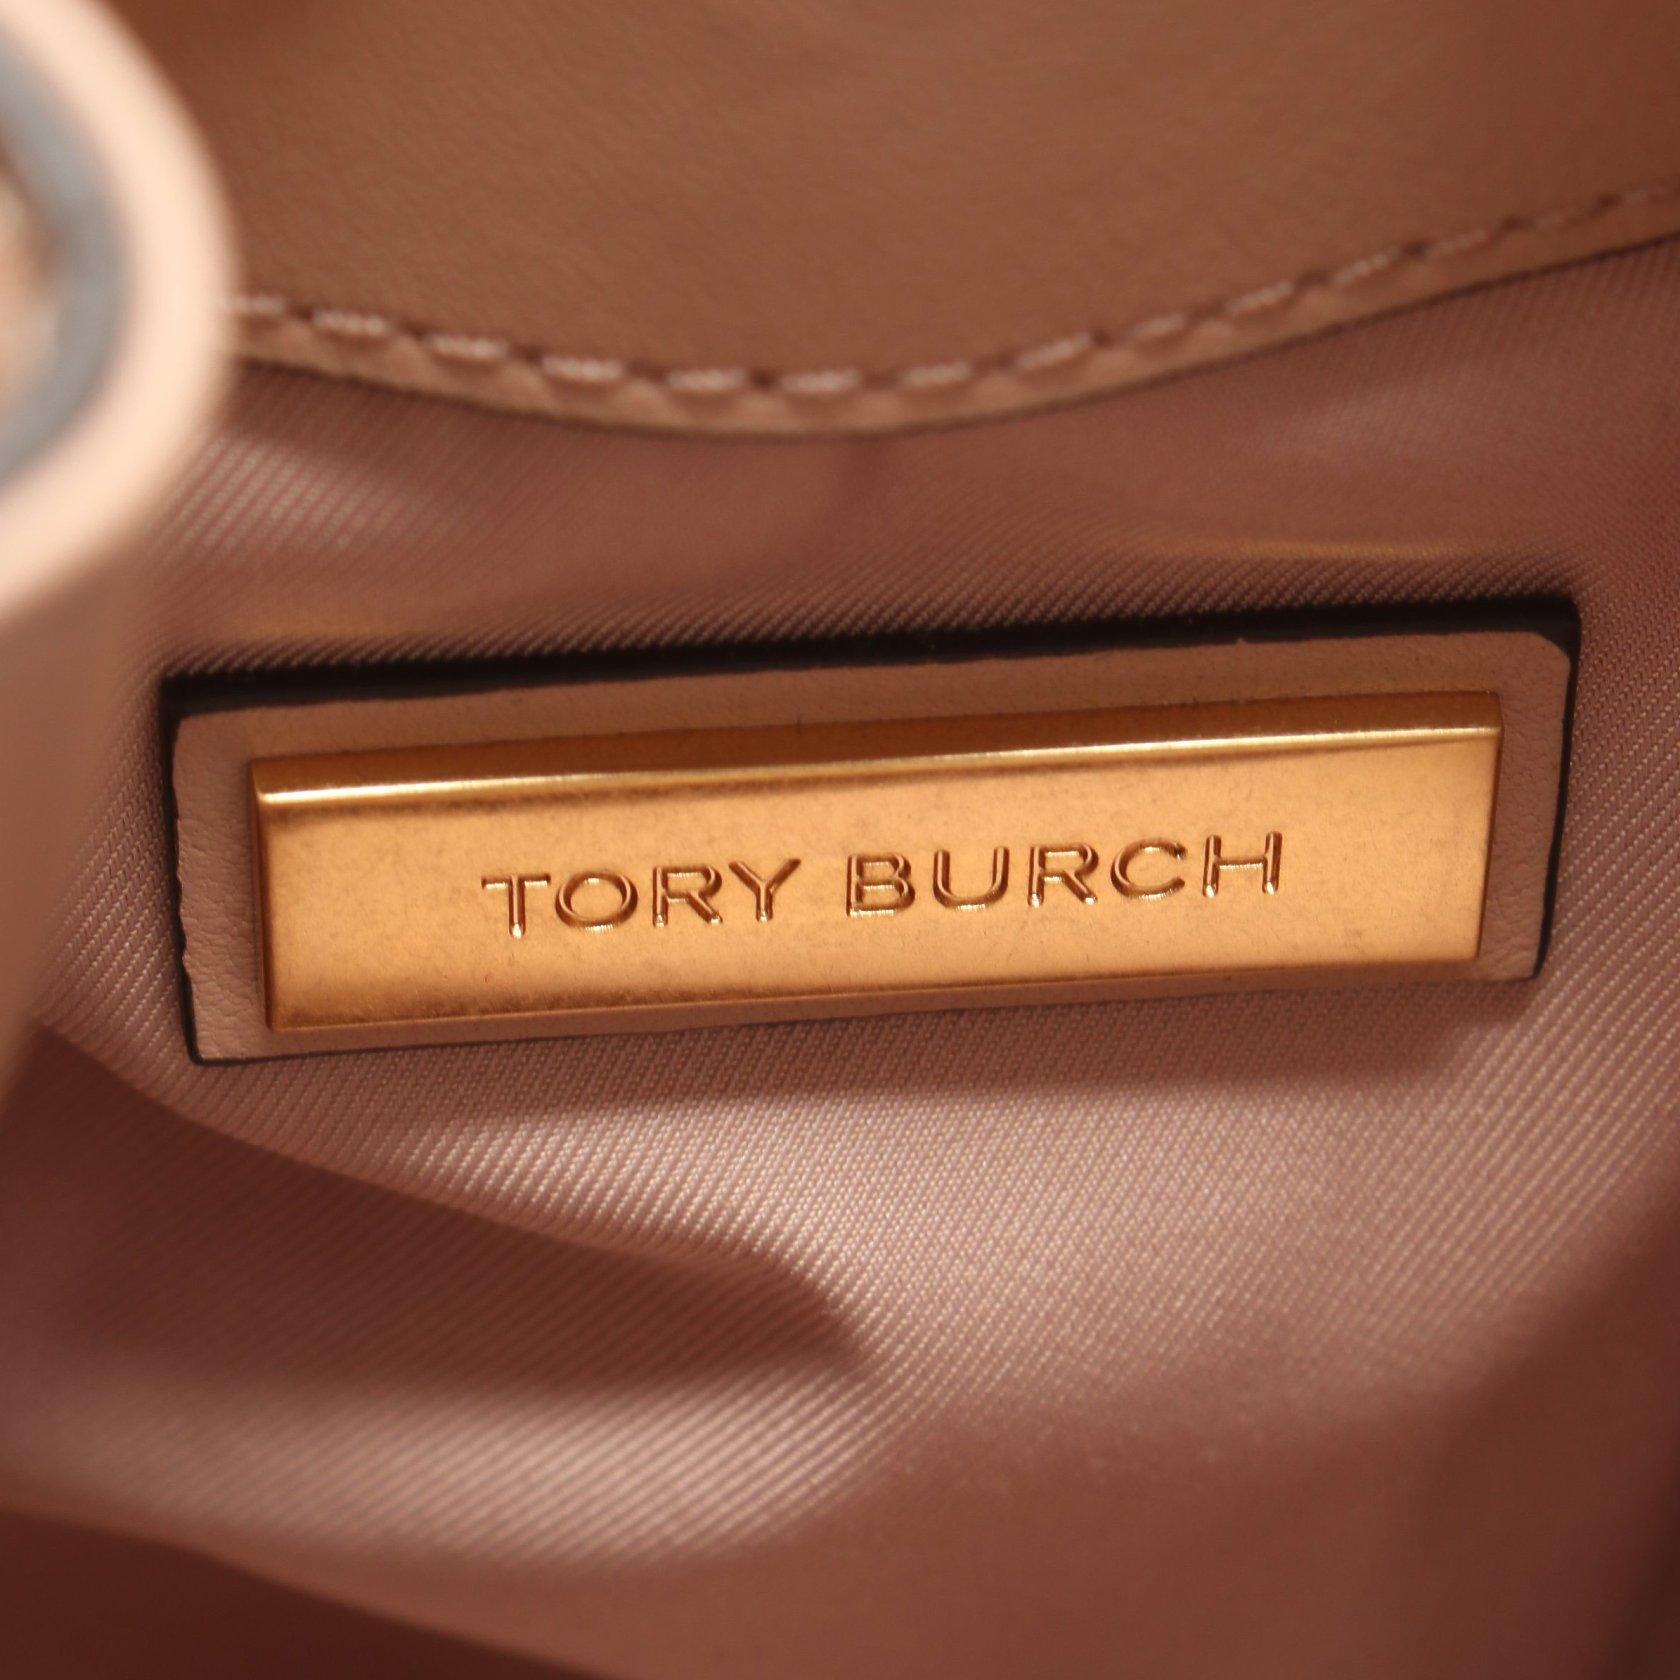 TORY BURCH・バッグ・FLEMING MINI BACKPACK フレミング バックパック リュックサック フェイクレザー ピンクベージュ